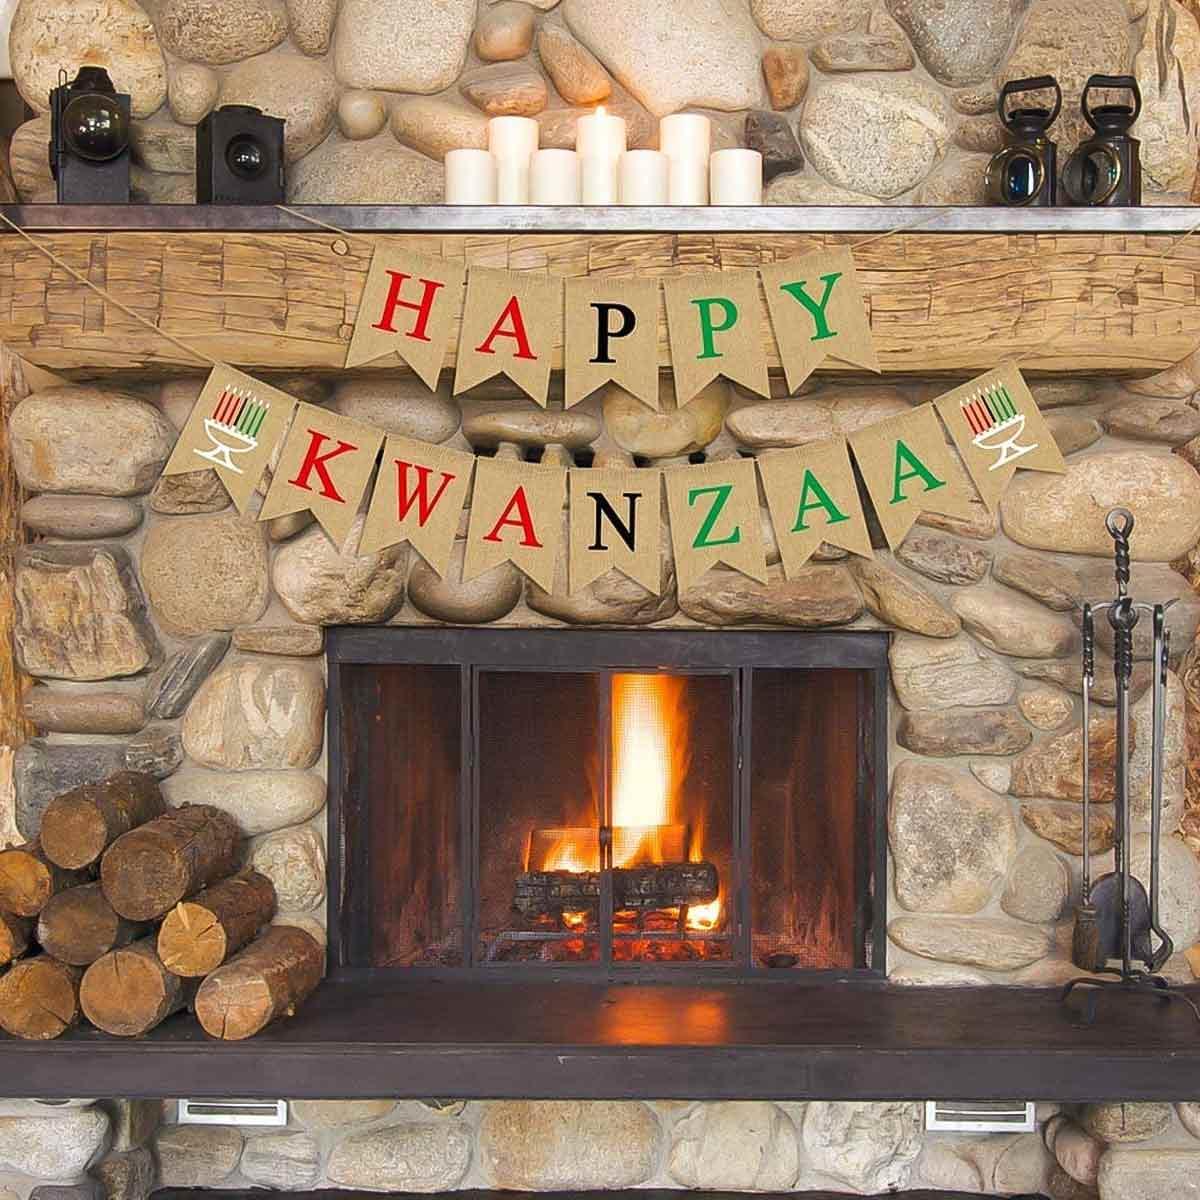 Kwanzaa Banner on mantle.